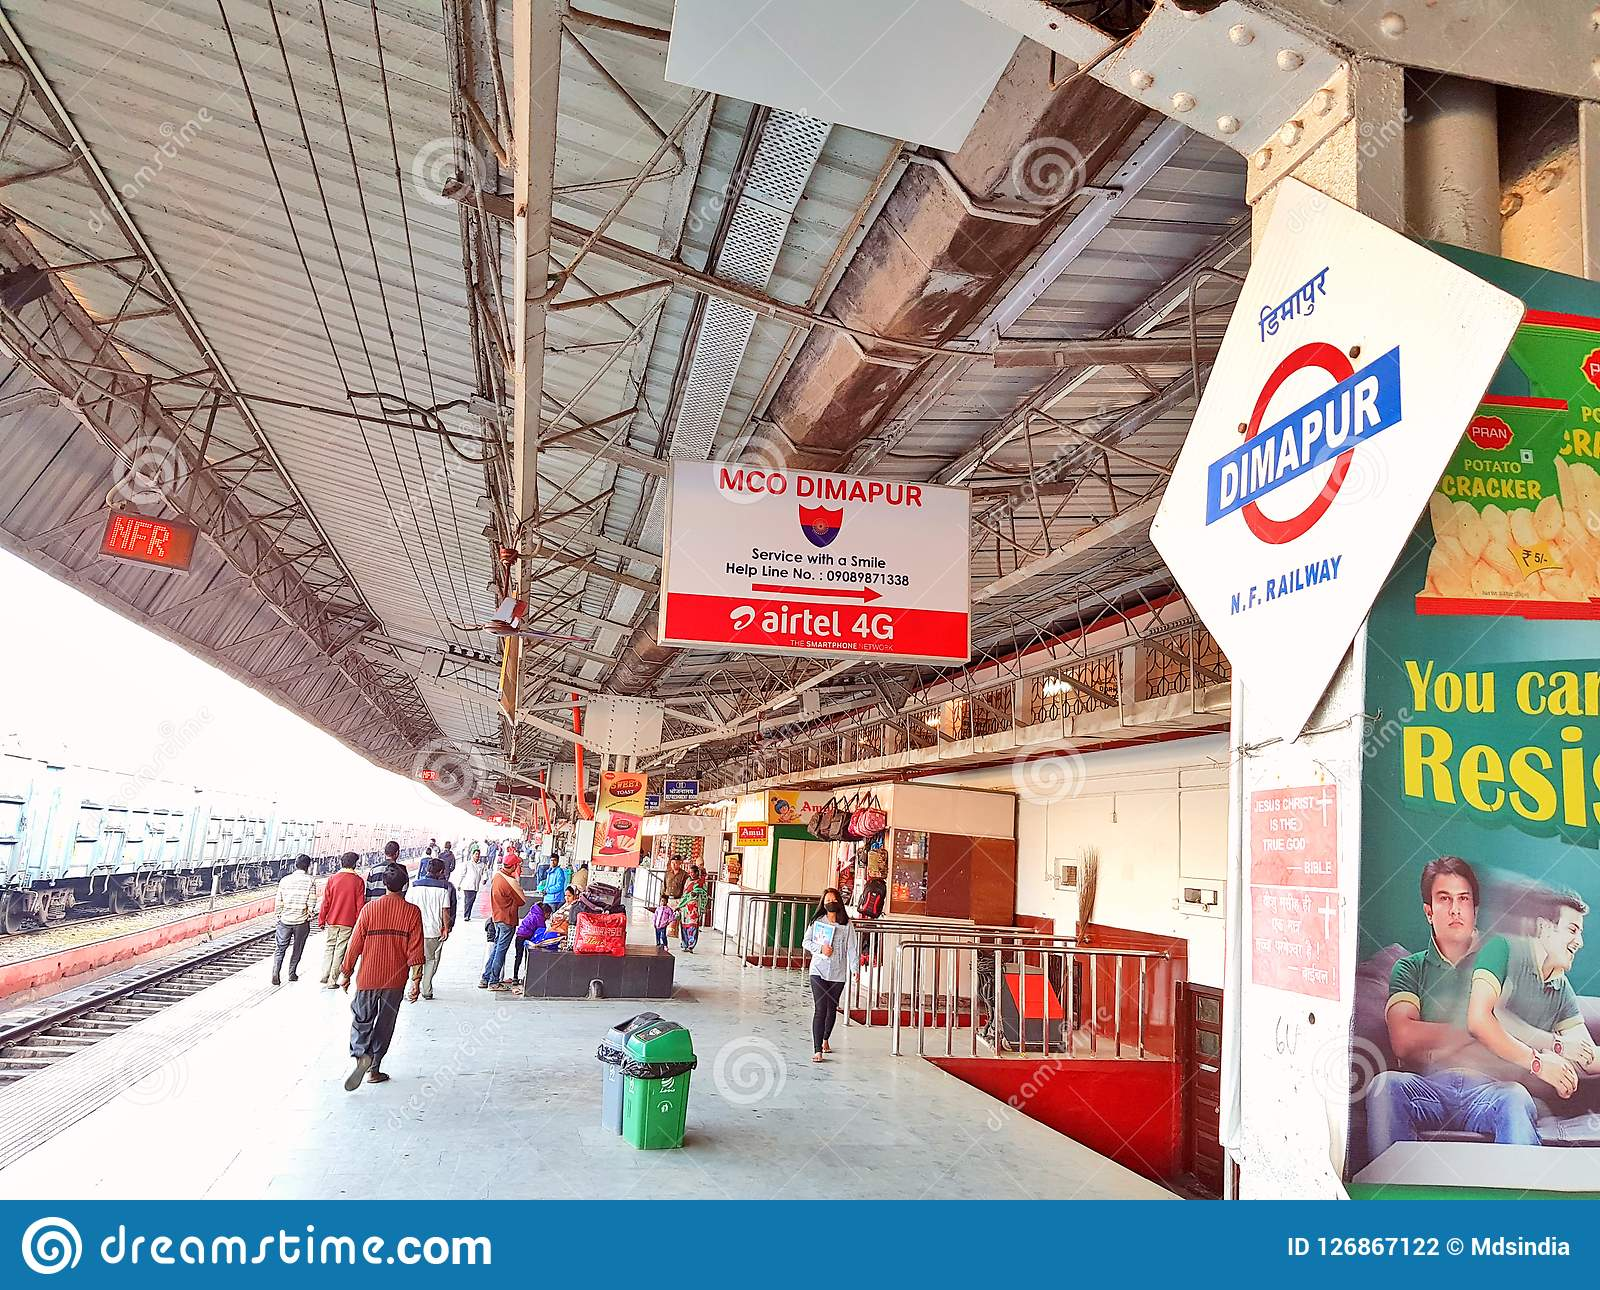 Plate-forme ferroviaire de gare ferroviaire de Dimapur